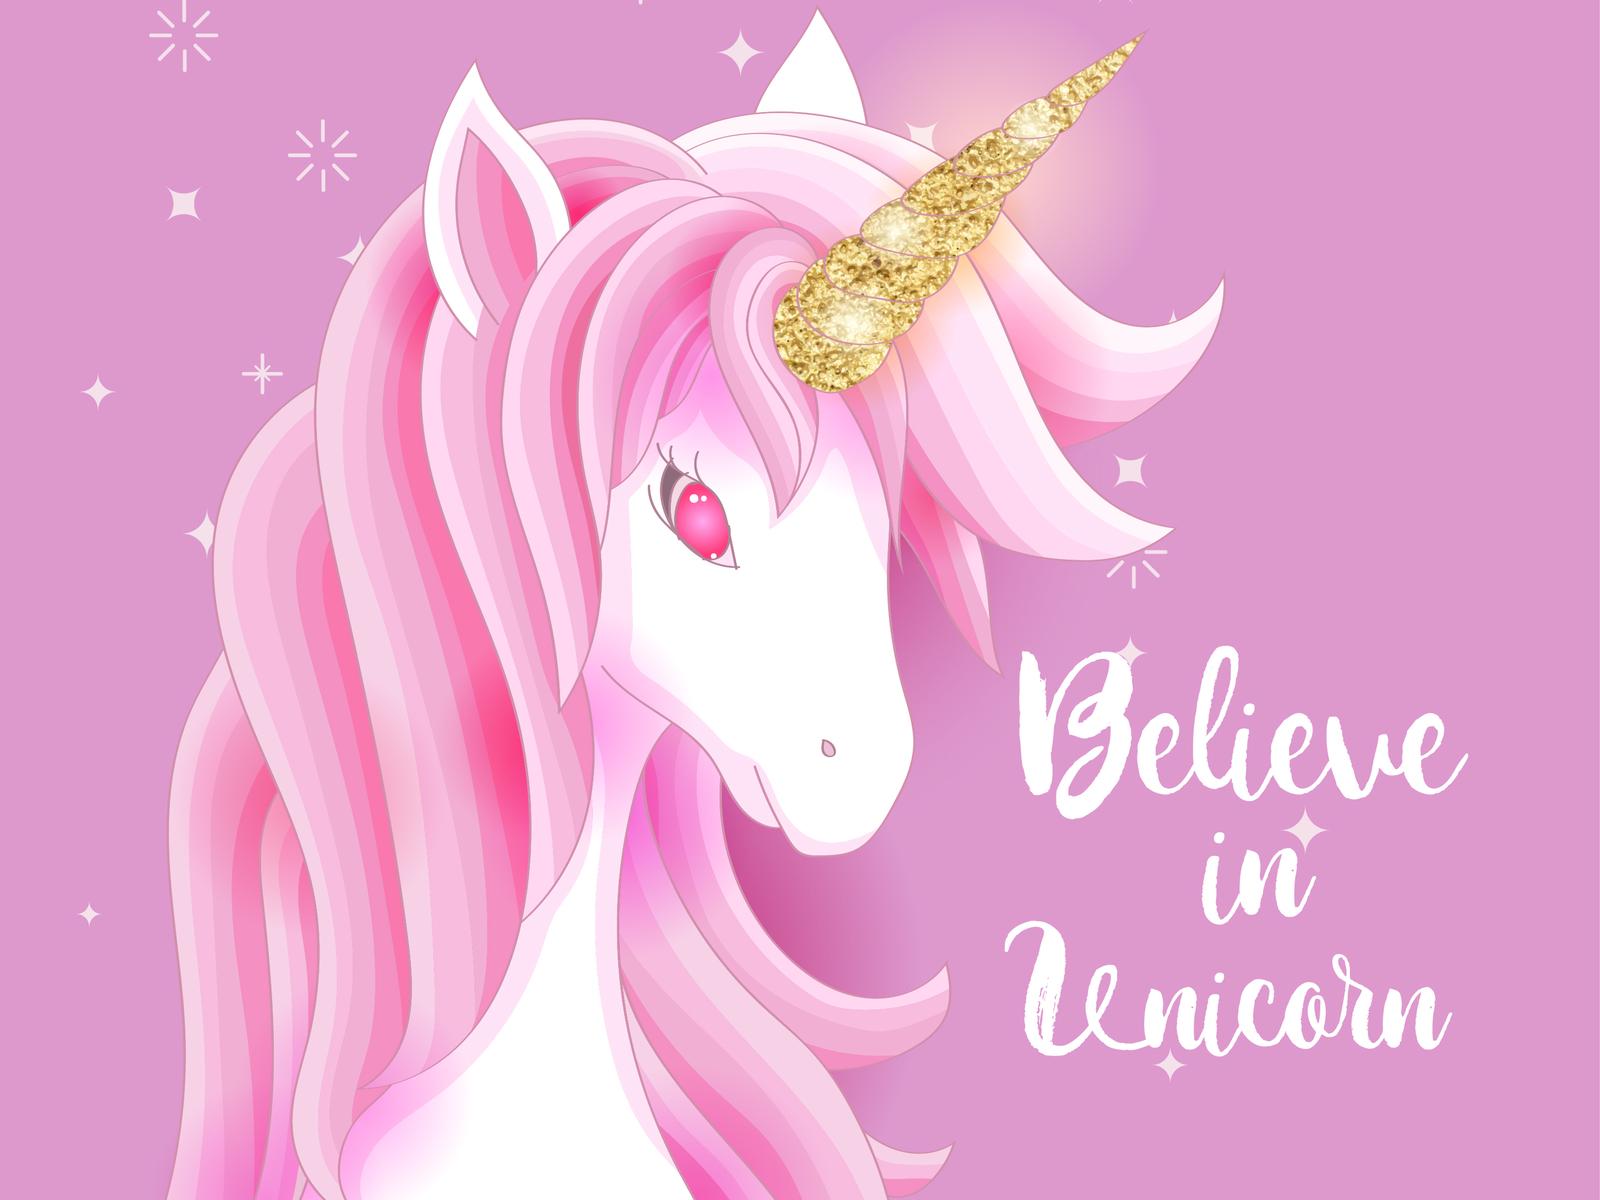 cute unicorn with gold glitter by volcebyyou Studio on ...